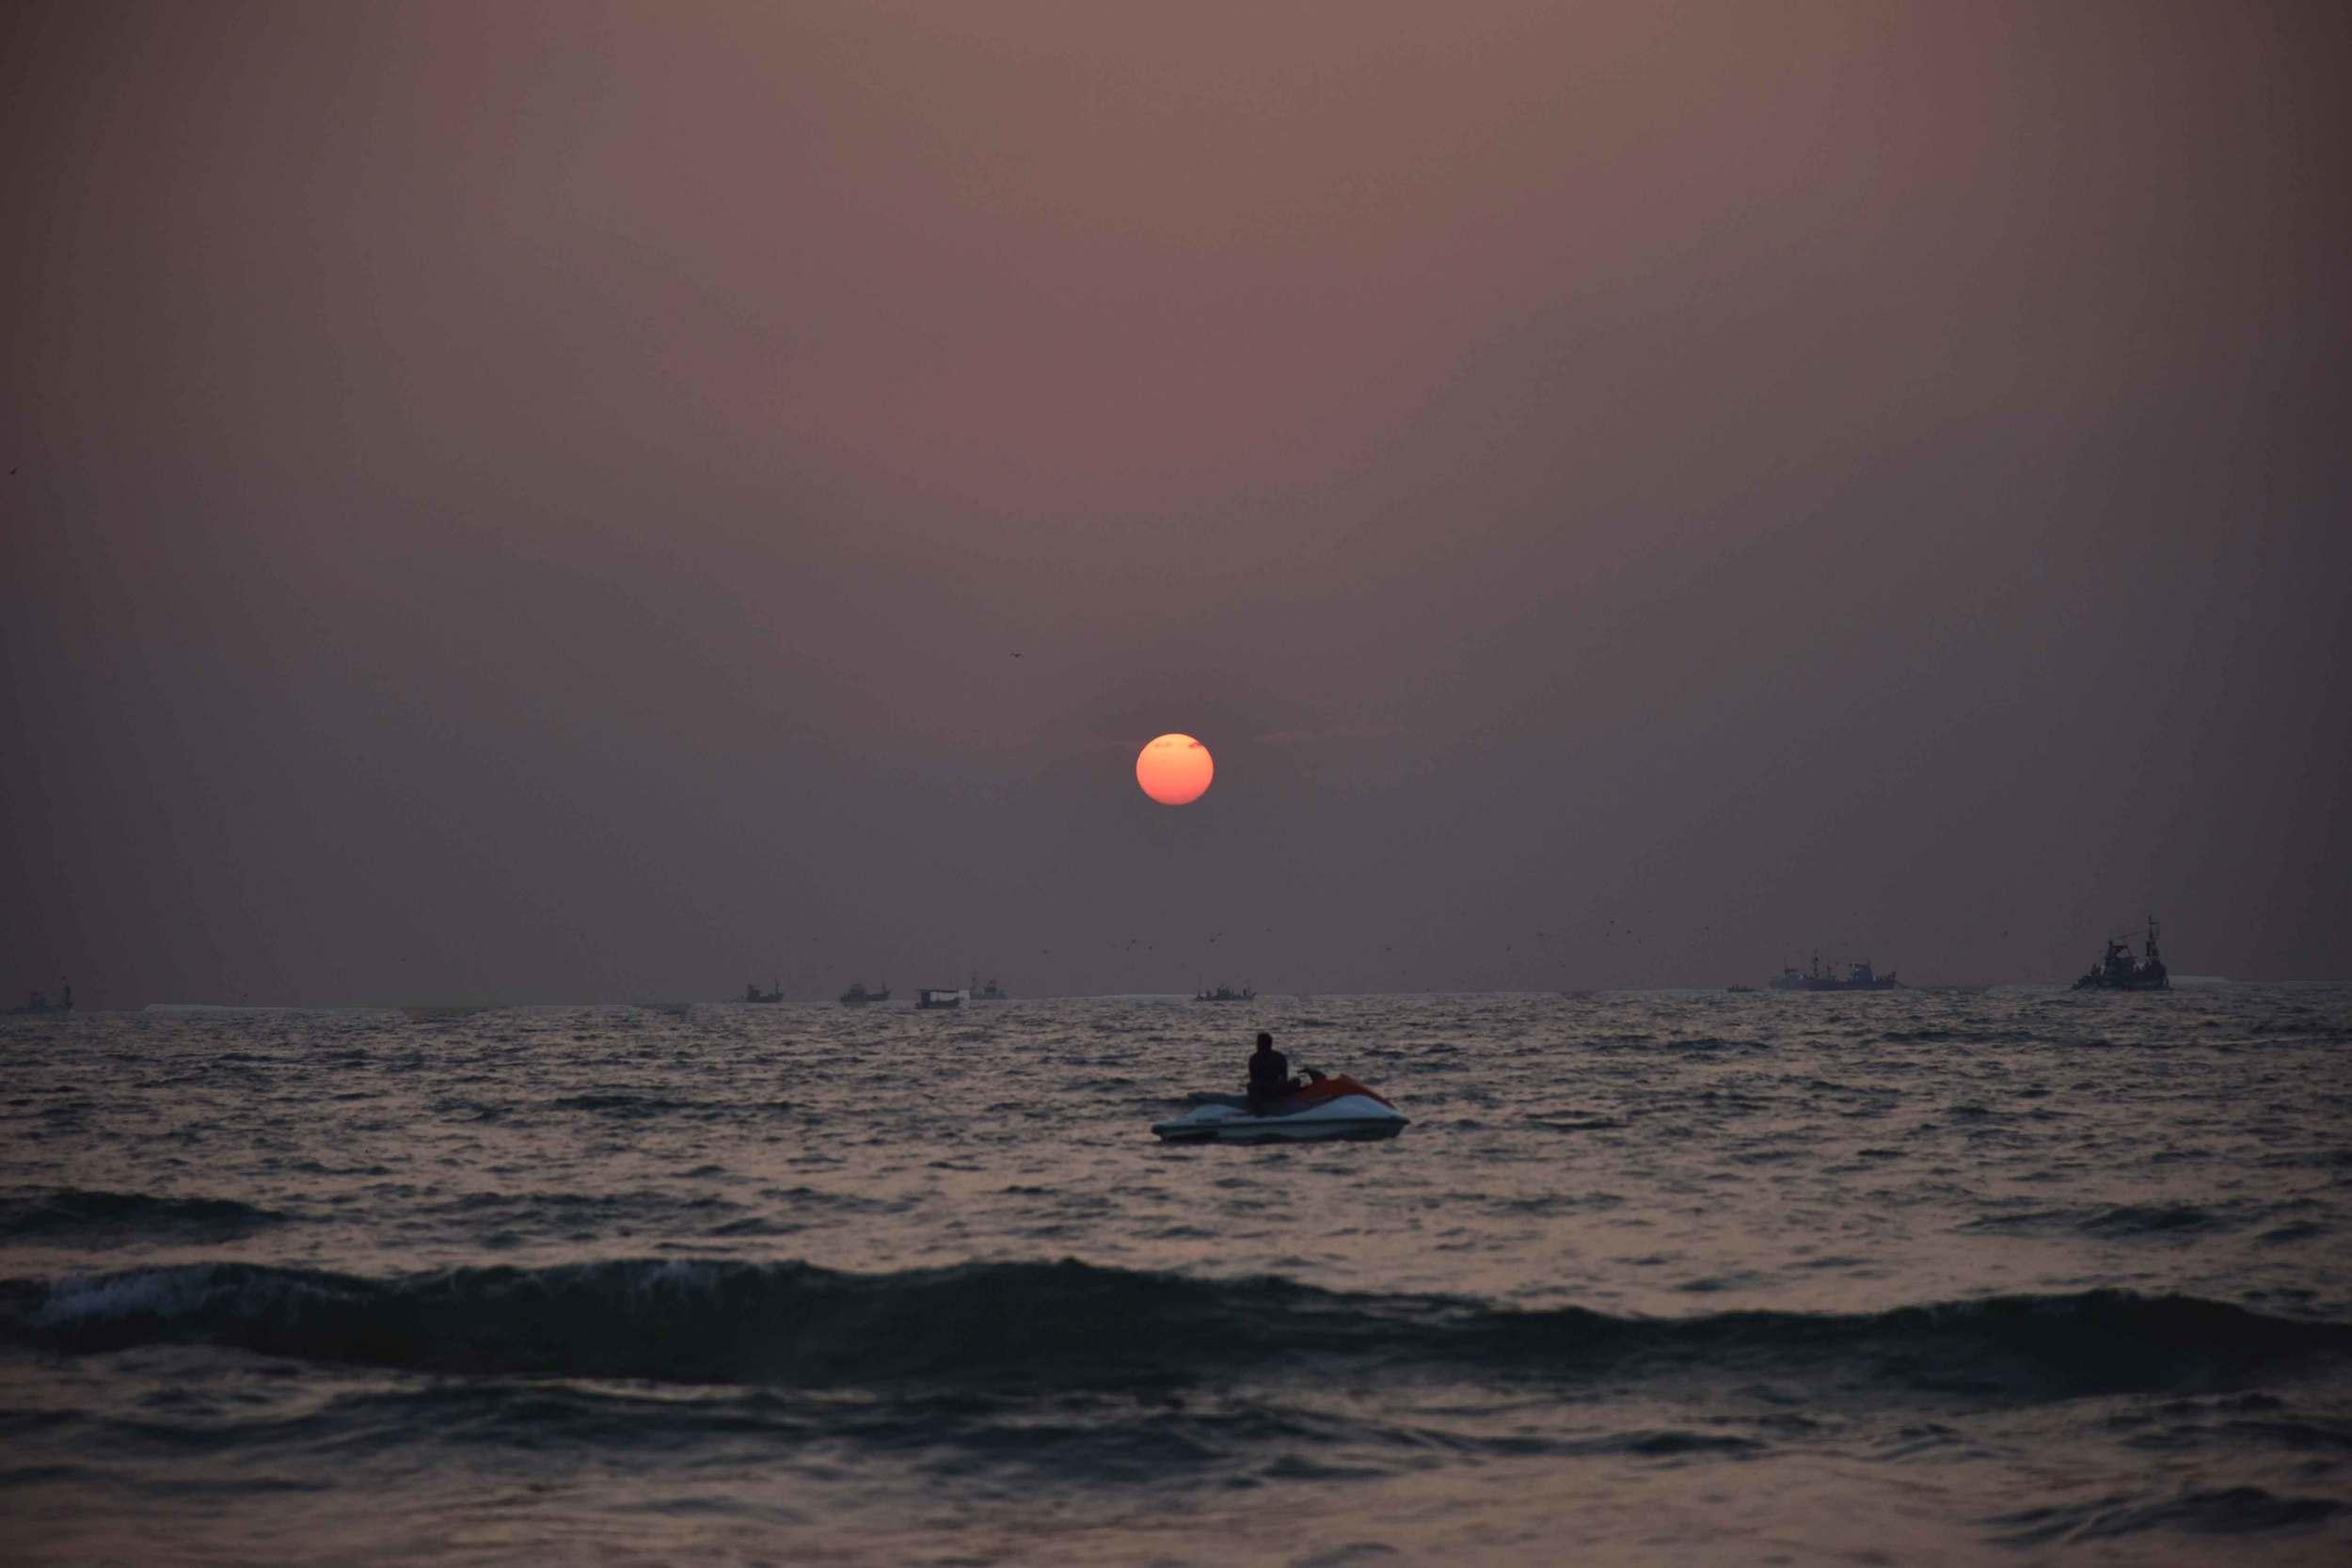 Arabian Sea, sunset time, Goa, India. Image©thingstodot.com